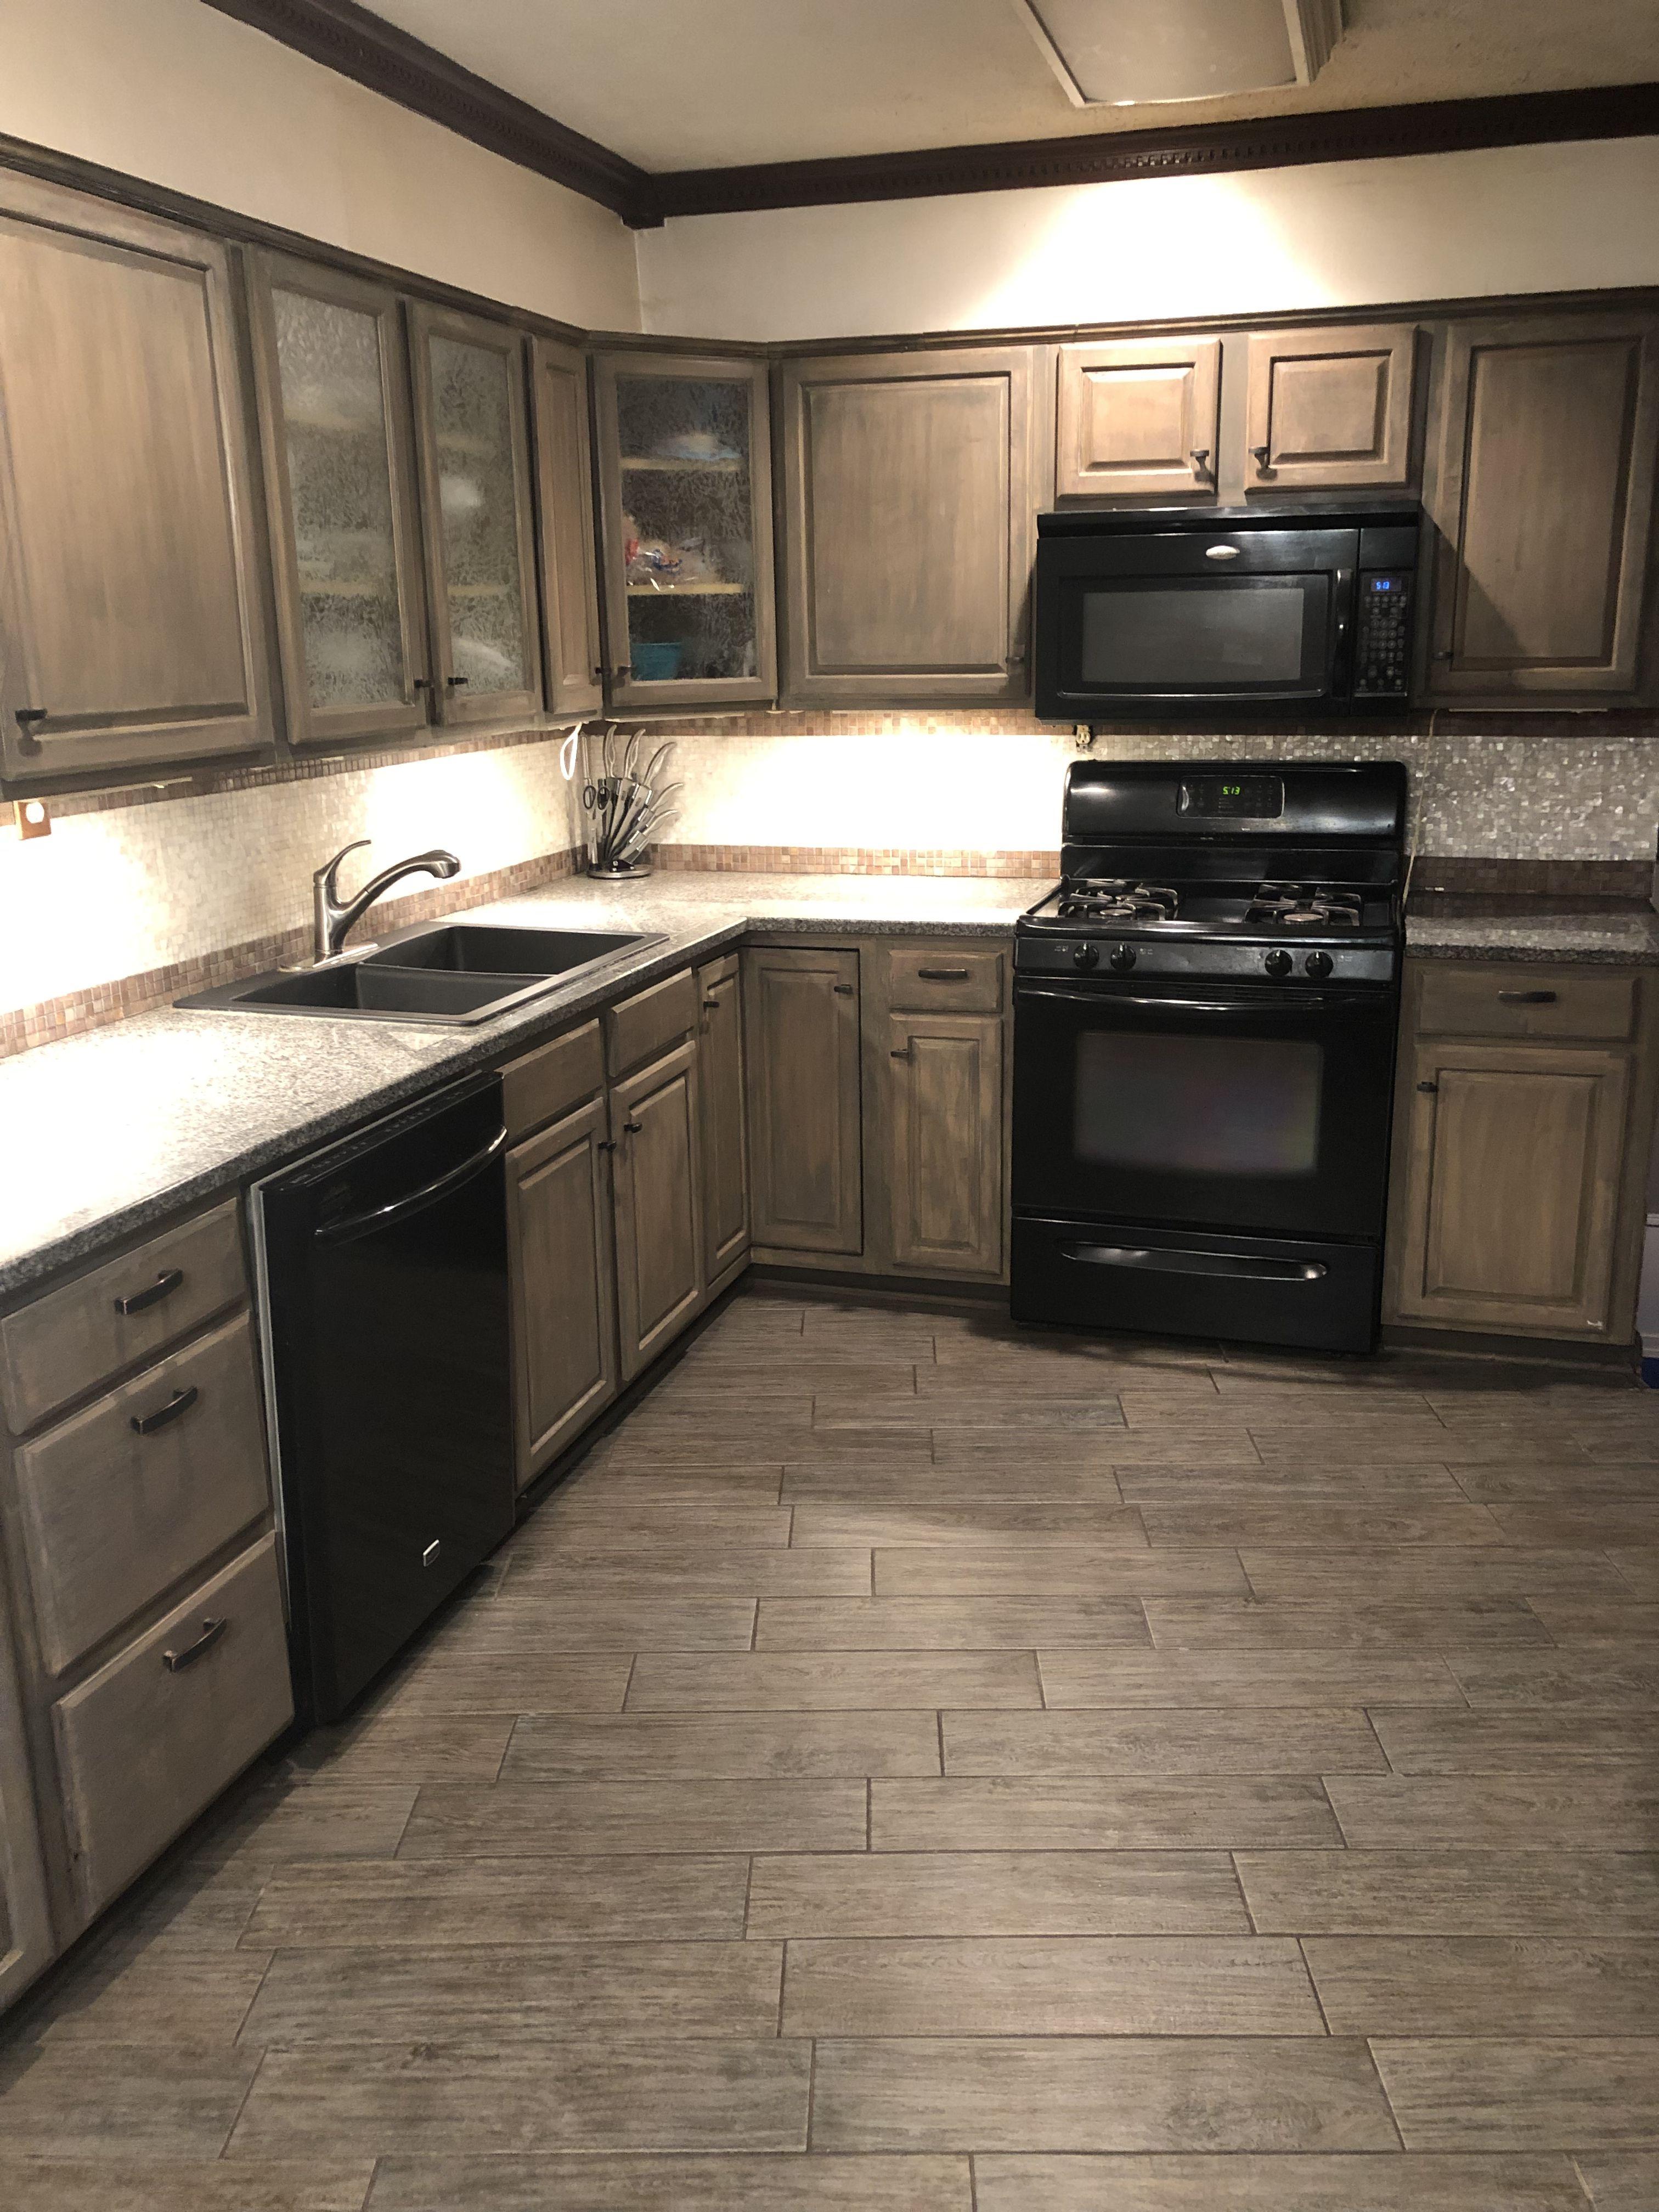 gray washed cabinets mother of pearl backsplash plank kitchen floor rh pinterest com